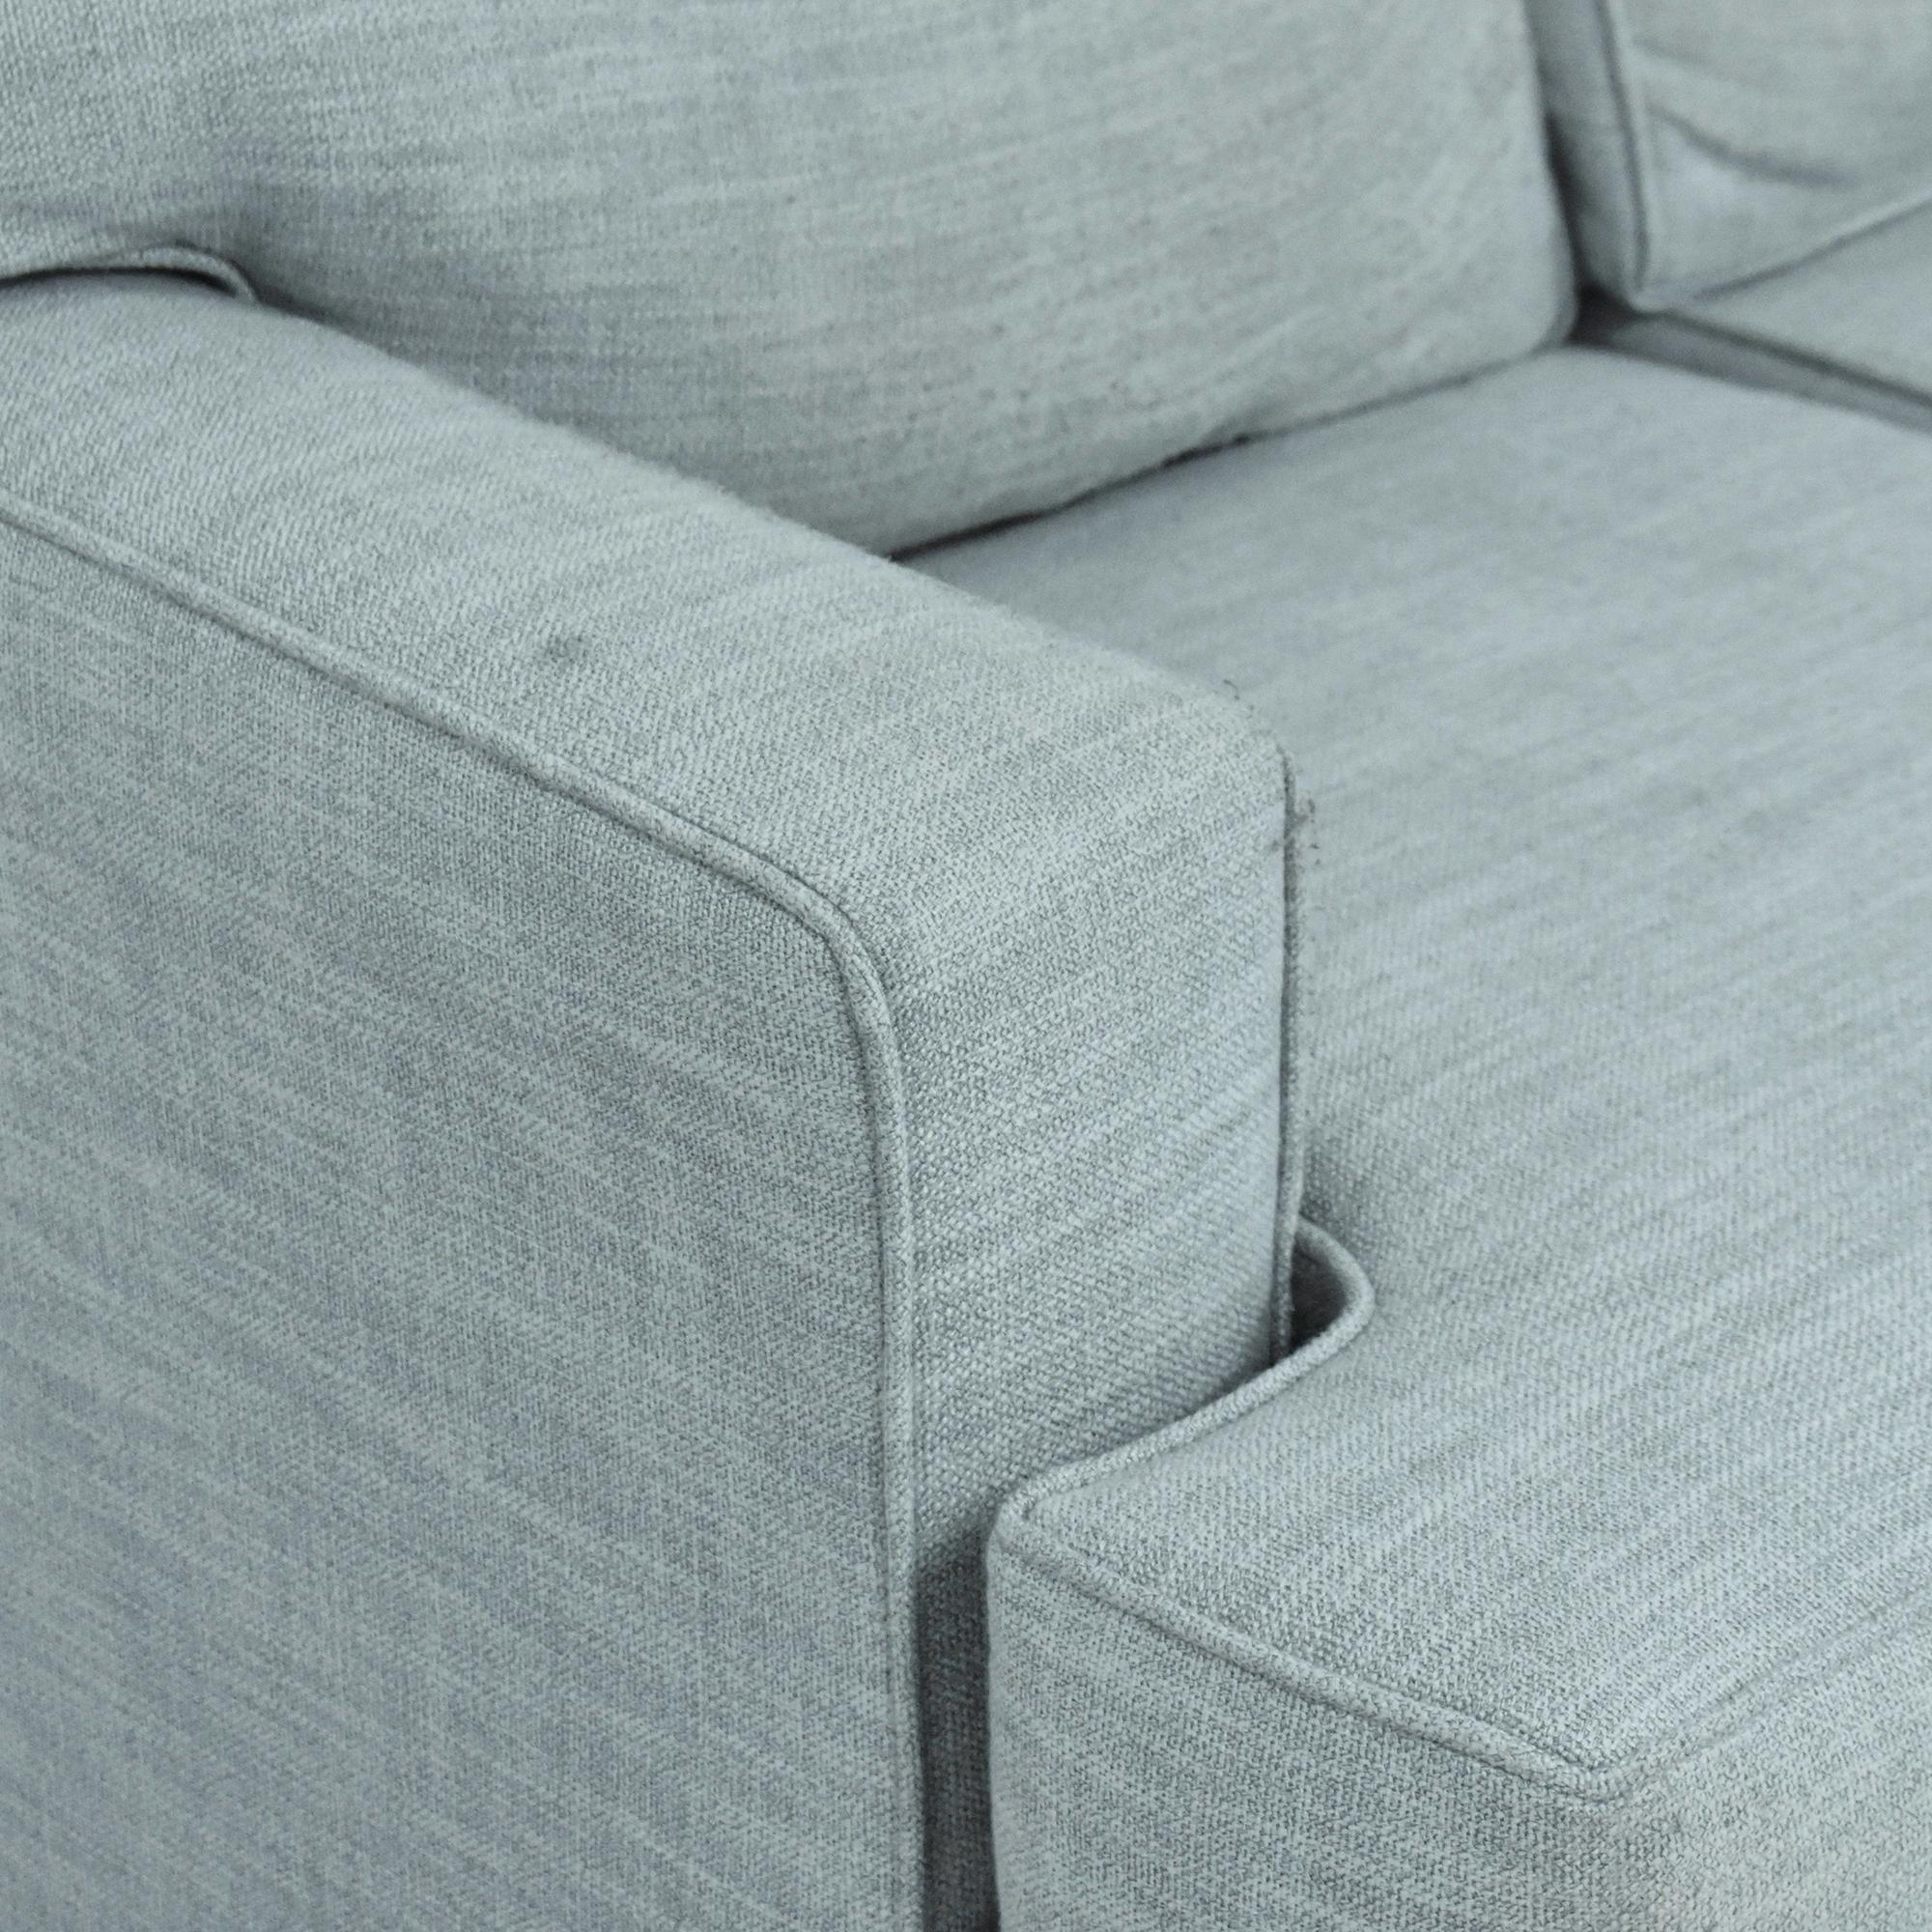 KFI KFI Corner Sectional Sofa coupon